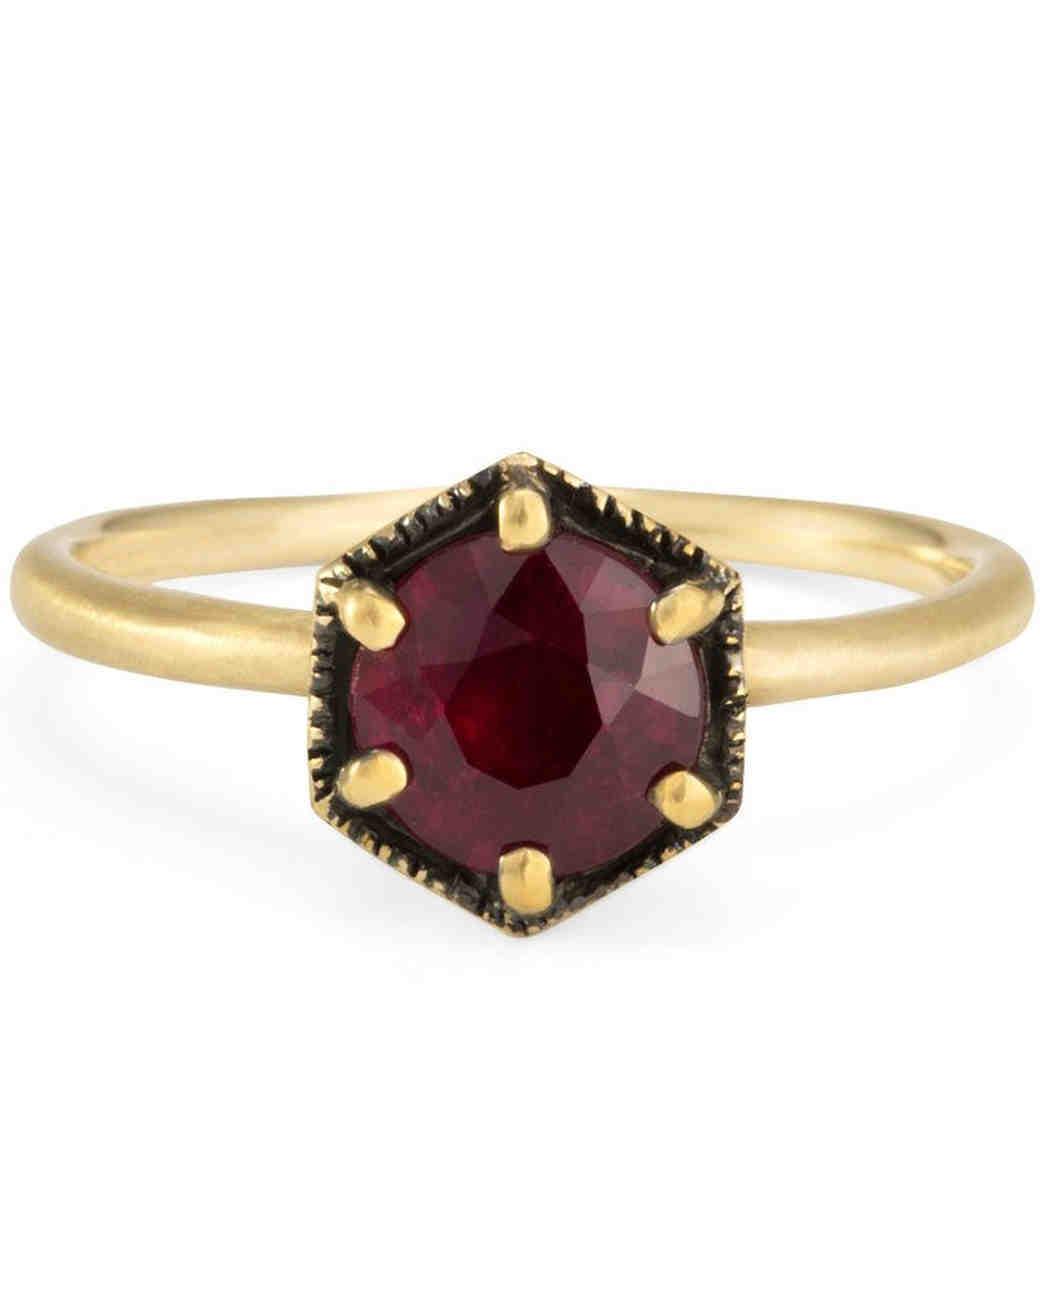 Satomi Kawakita Hexagonal Ruby Engagement Ring